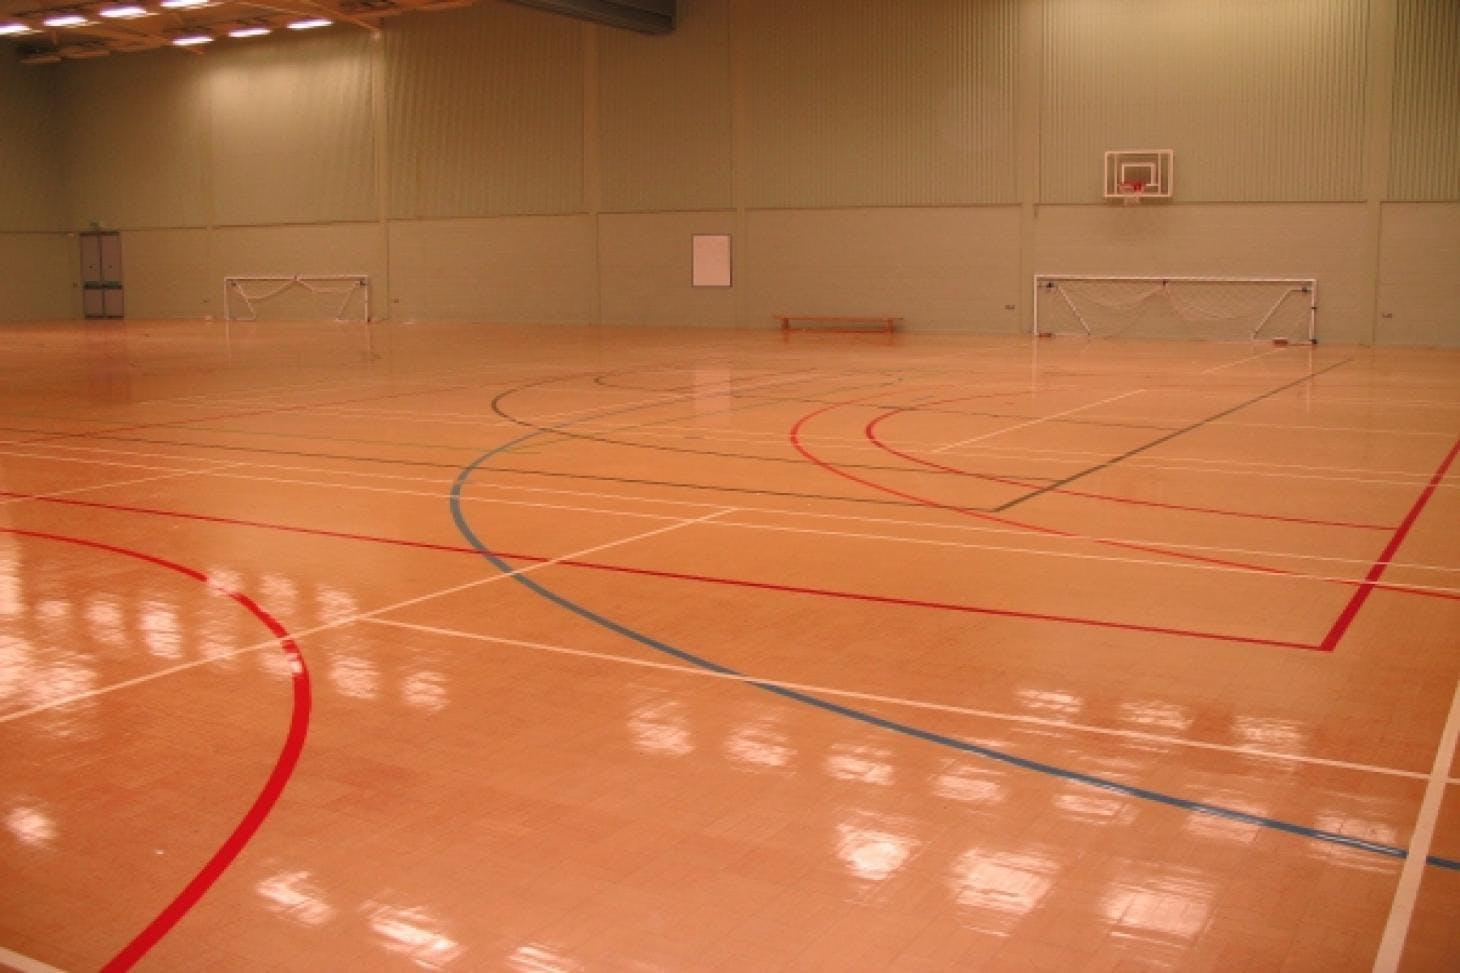 Herschel Sports Nets | Sports hall cricket facilities